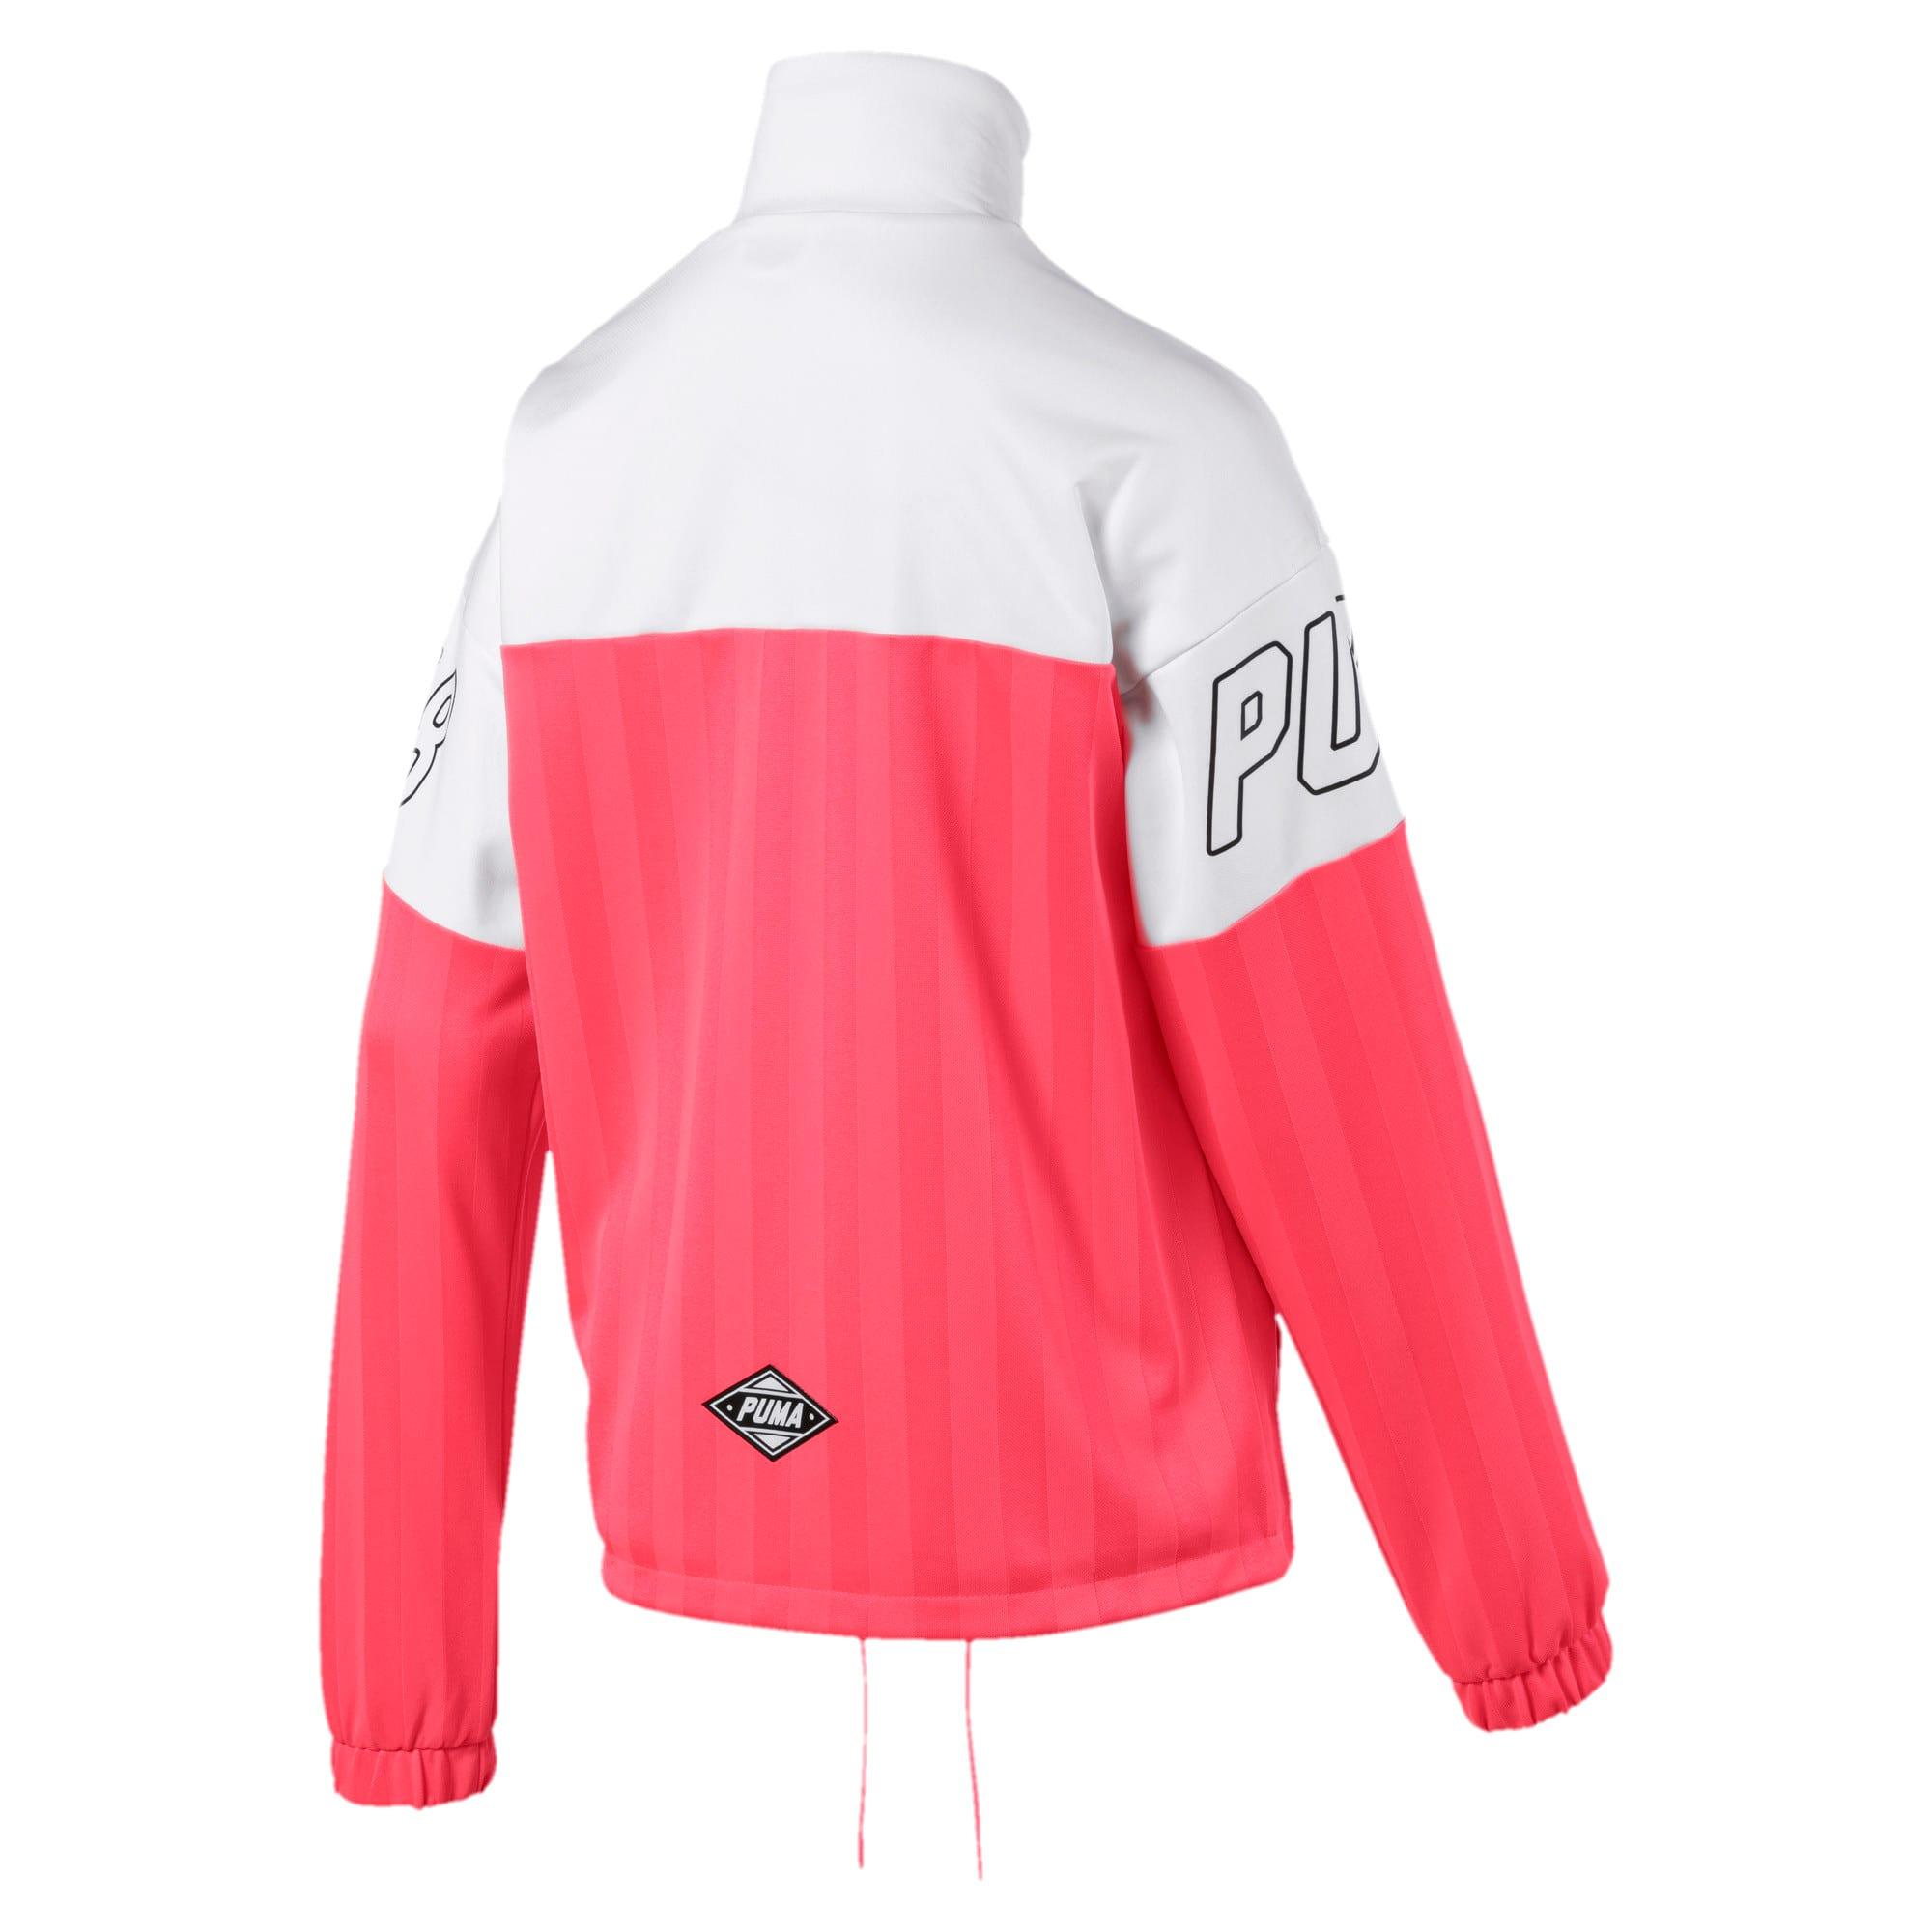 Thumbnail 5 of luXTG Jacquard Women's Track Jacket, Pink Alert, medium